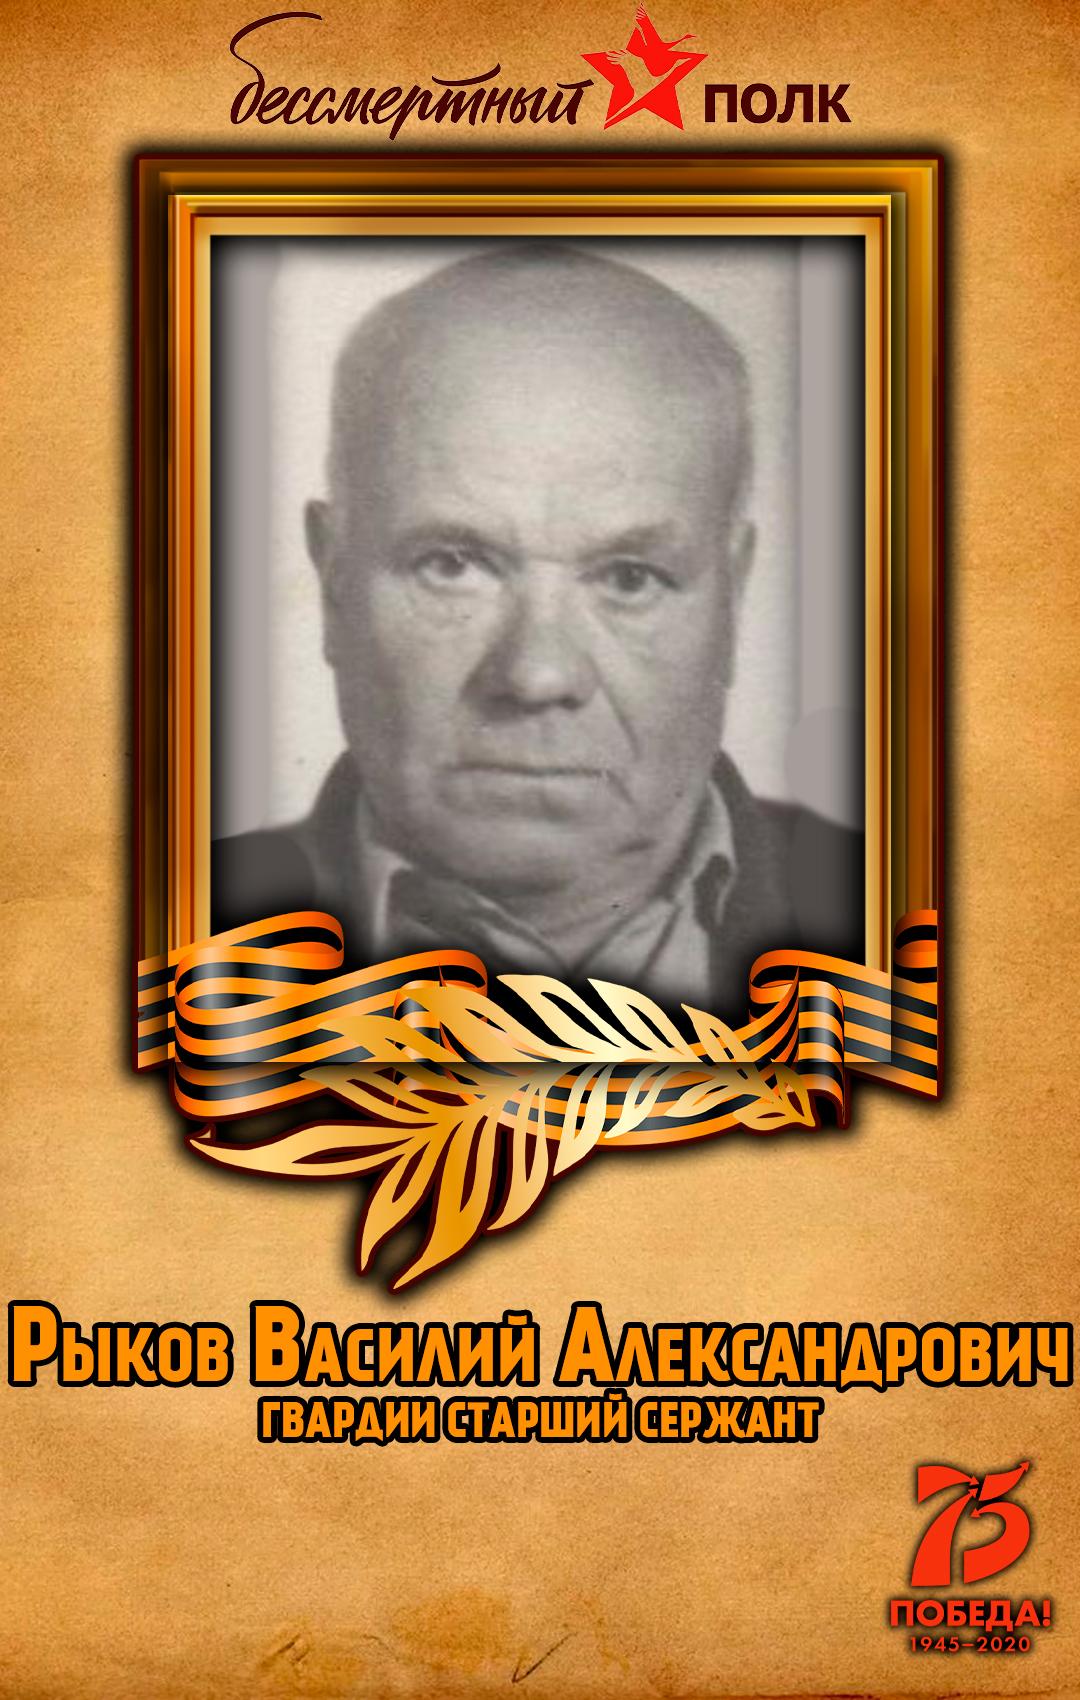 Рыков-Василий-Александрович